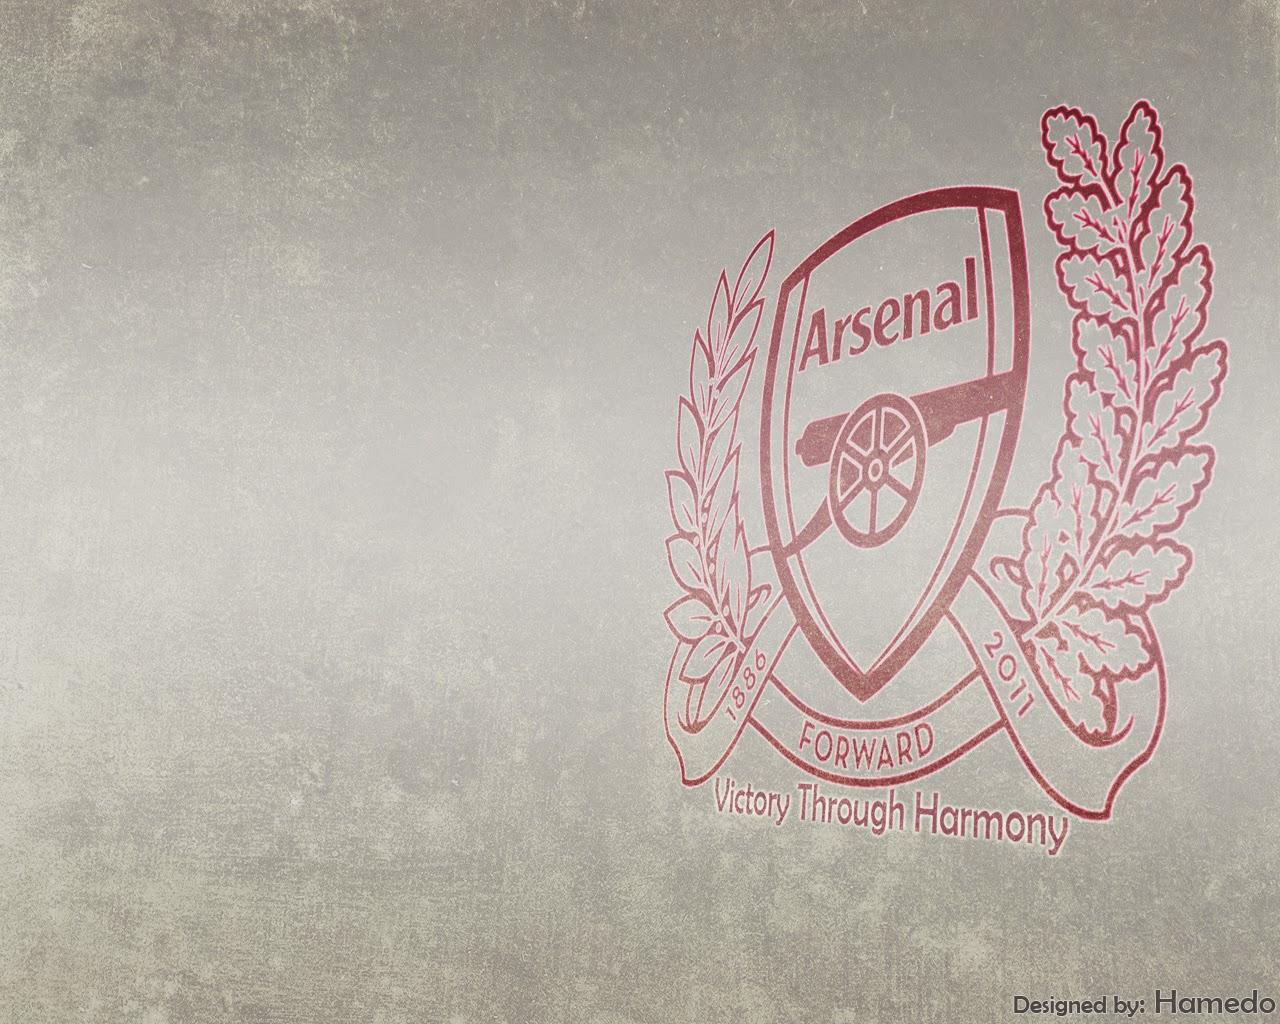 Arsenal 3d Live Wallpaper Apk Arsenal Football Club Wallpaper Download Gambar